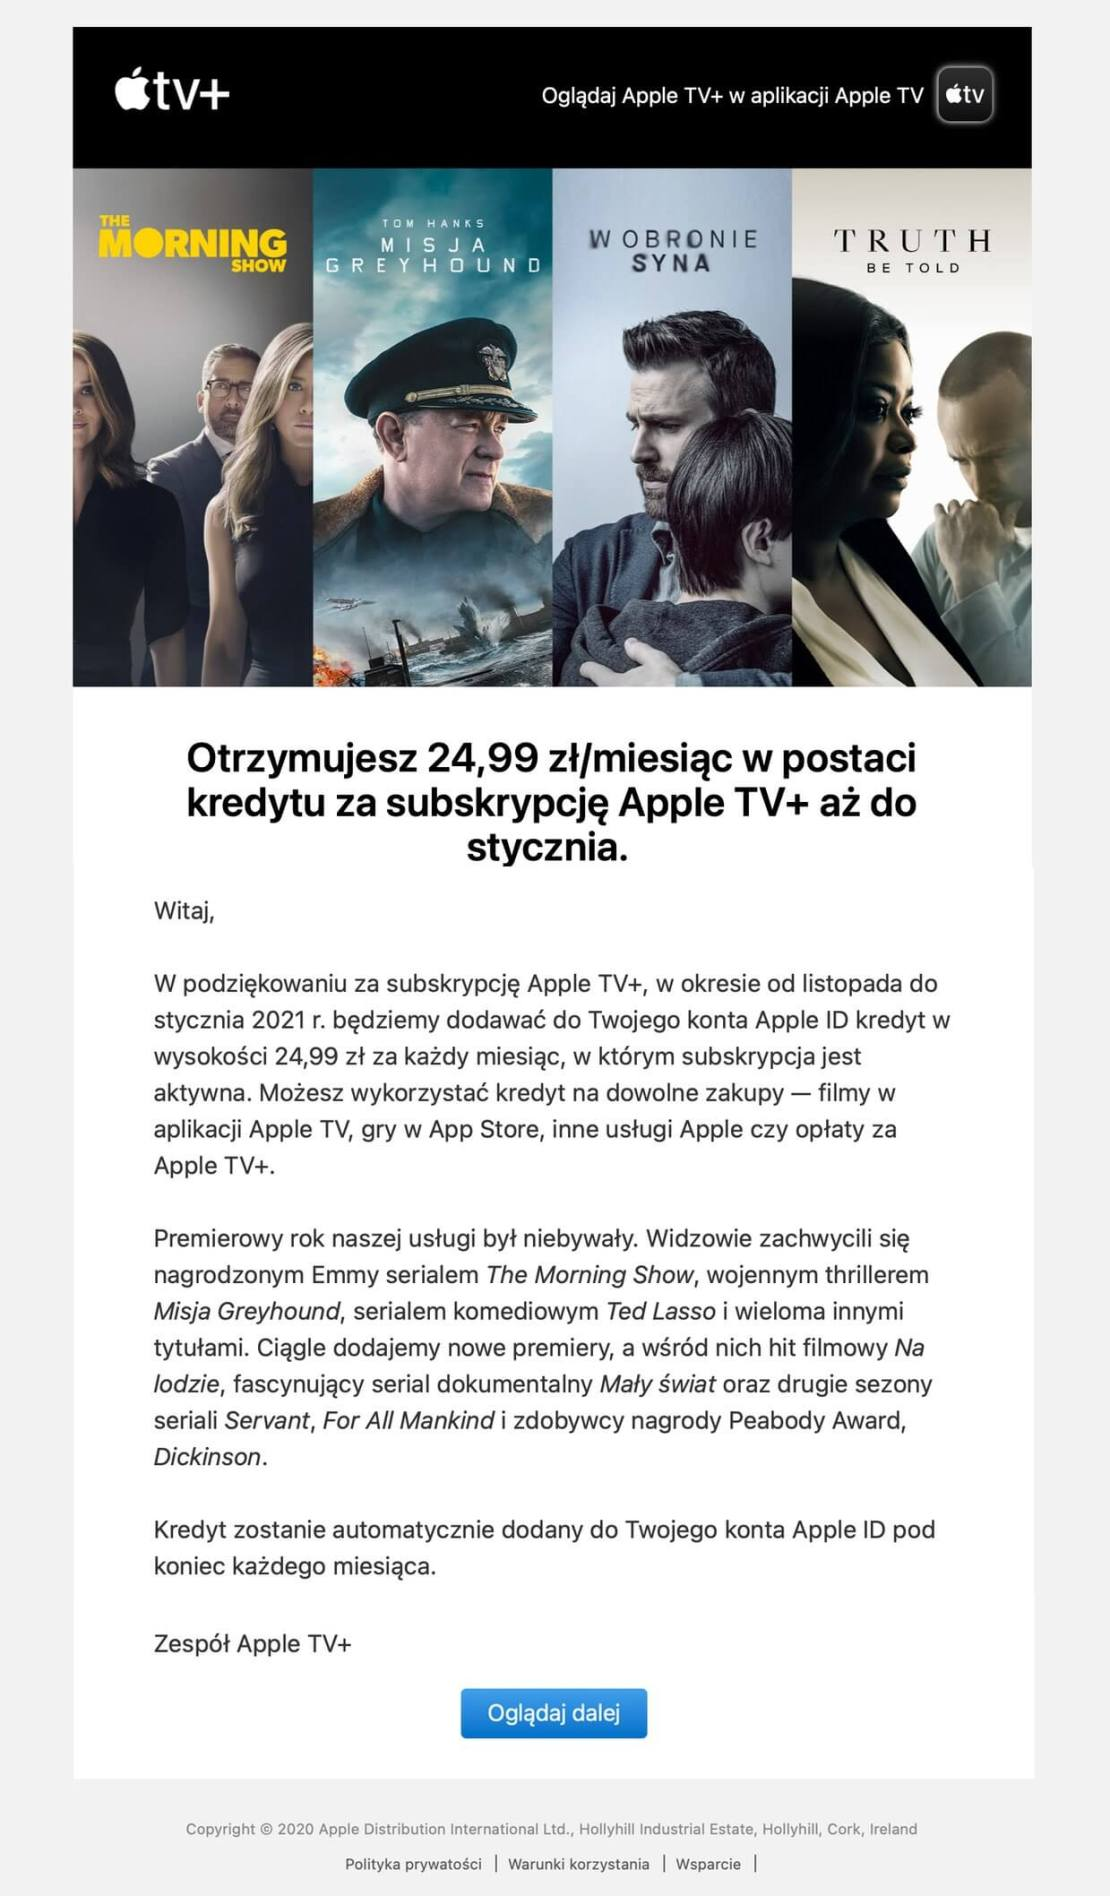 E-mailing Apple TV+ promo PL 2020